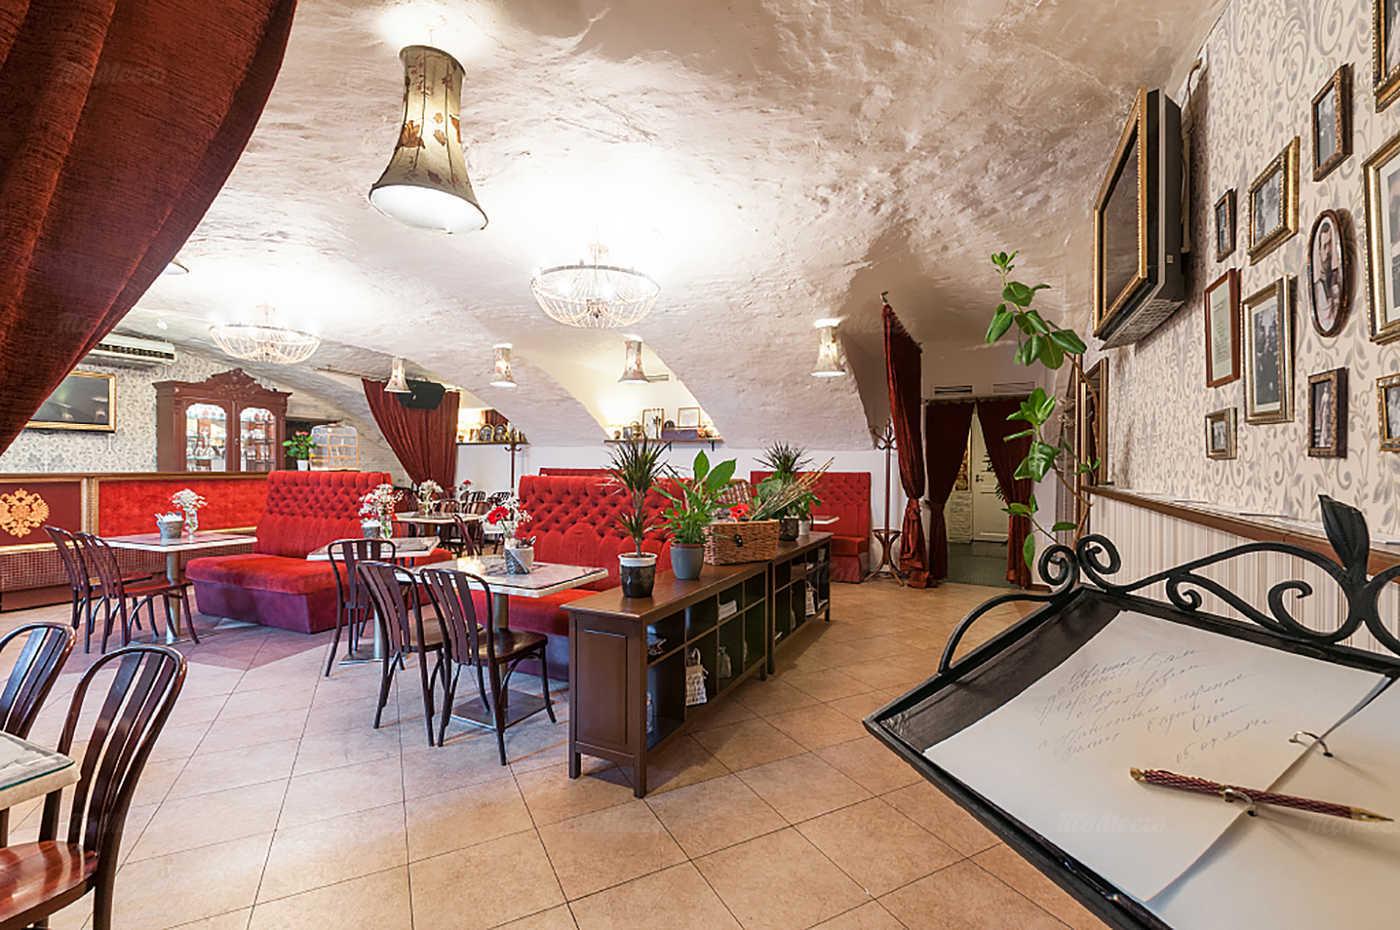 Кафе Распутин на набережной реки Мойки фото 6